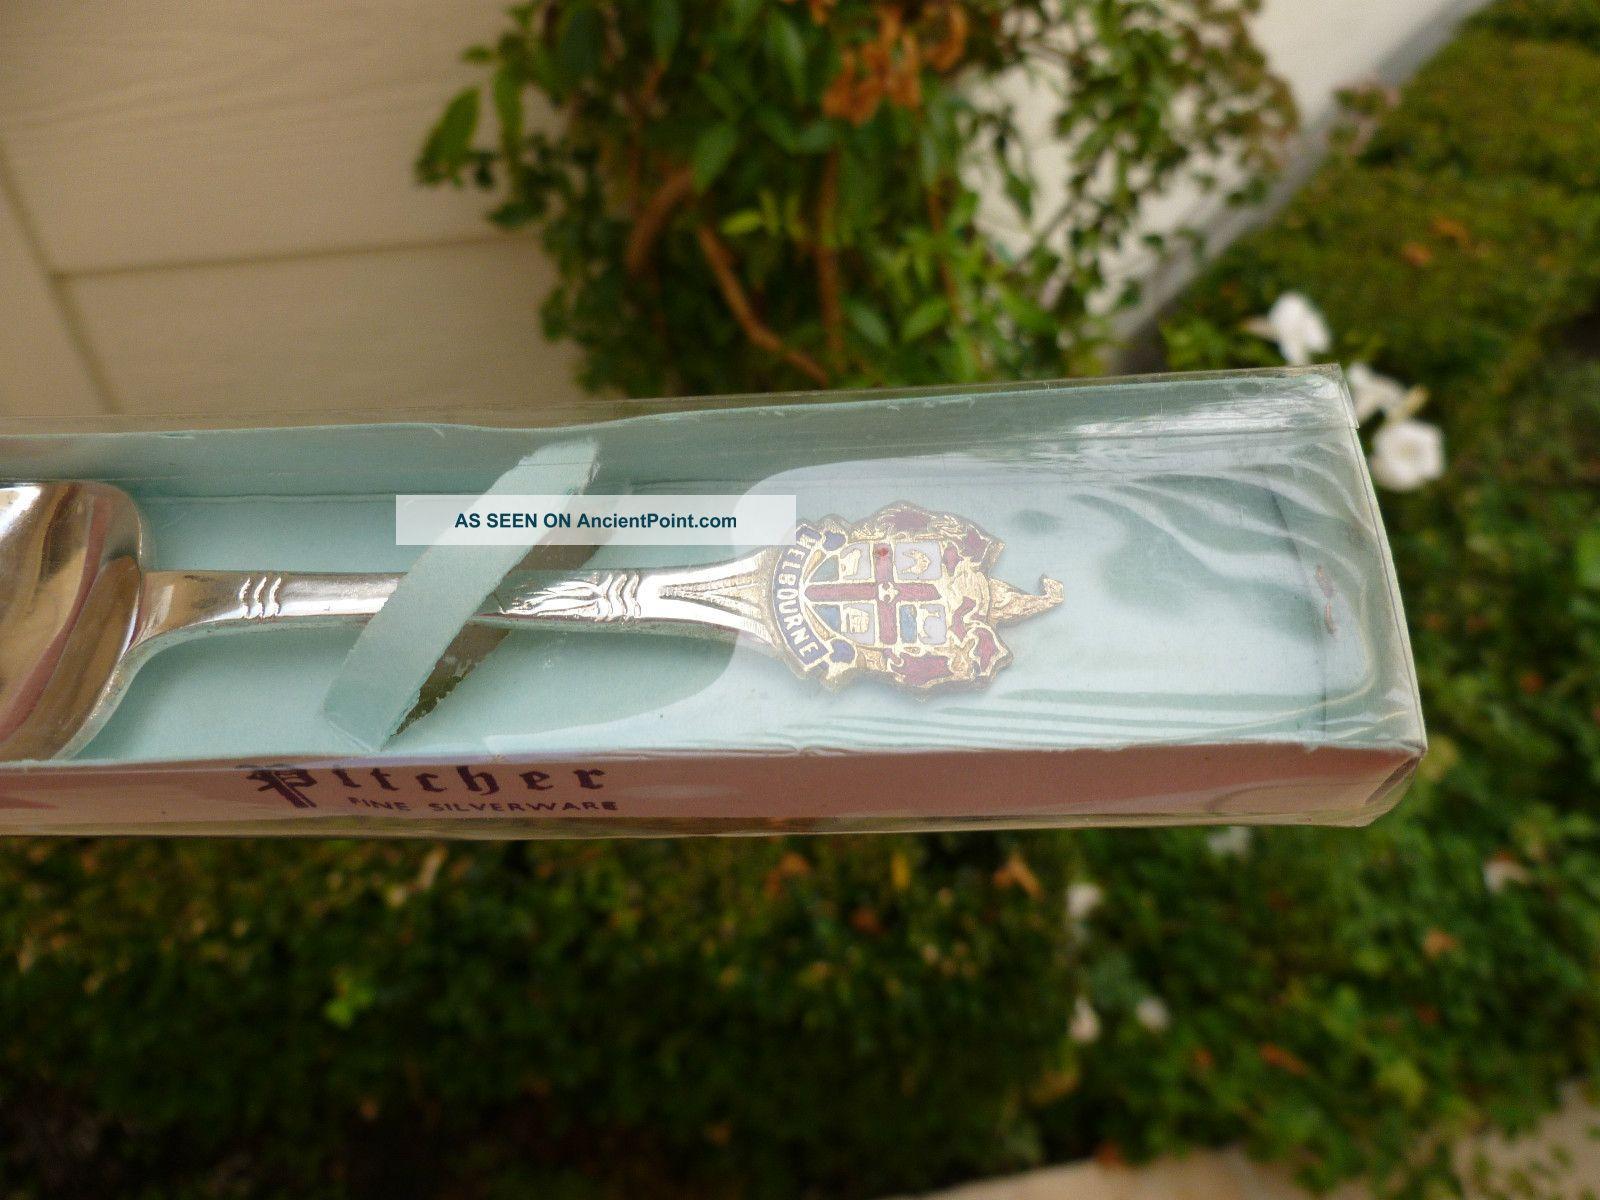 Pitcher Epsn A1 Silverware Enamel Souvenir Jam Spoon Melbourne Box Souvenir Spoons photo